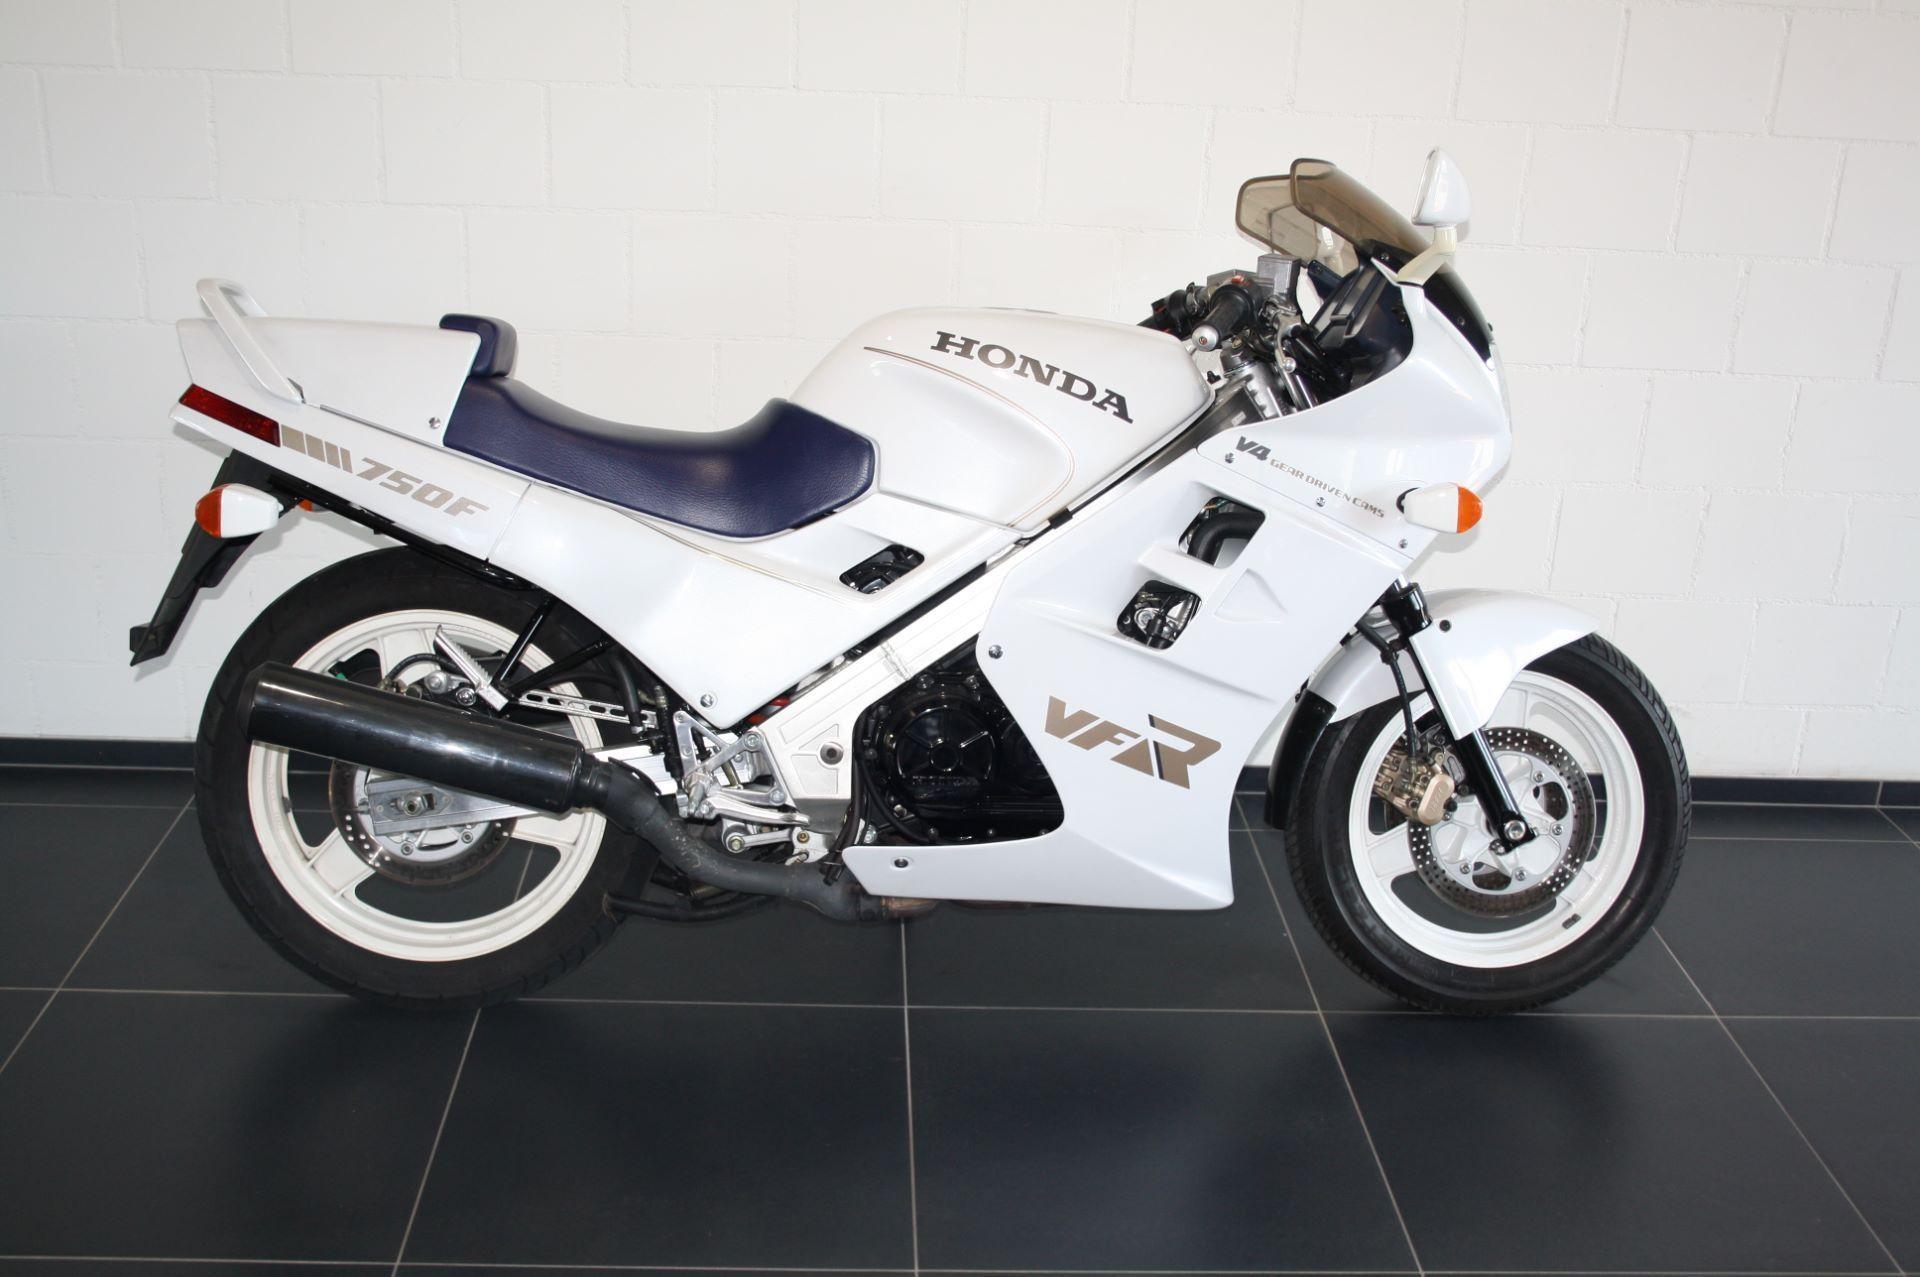 motorrad occasion kaufen honda vfr 750 f moto zentralschweiz perlen. Black Bedroom Furniture Sets. Home Design Ideas